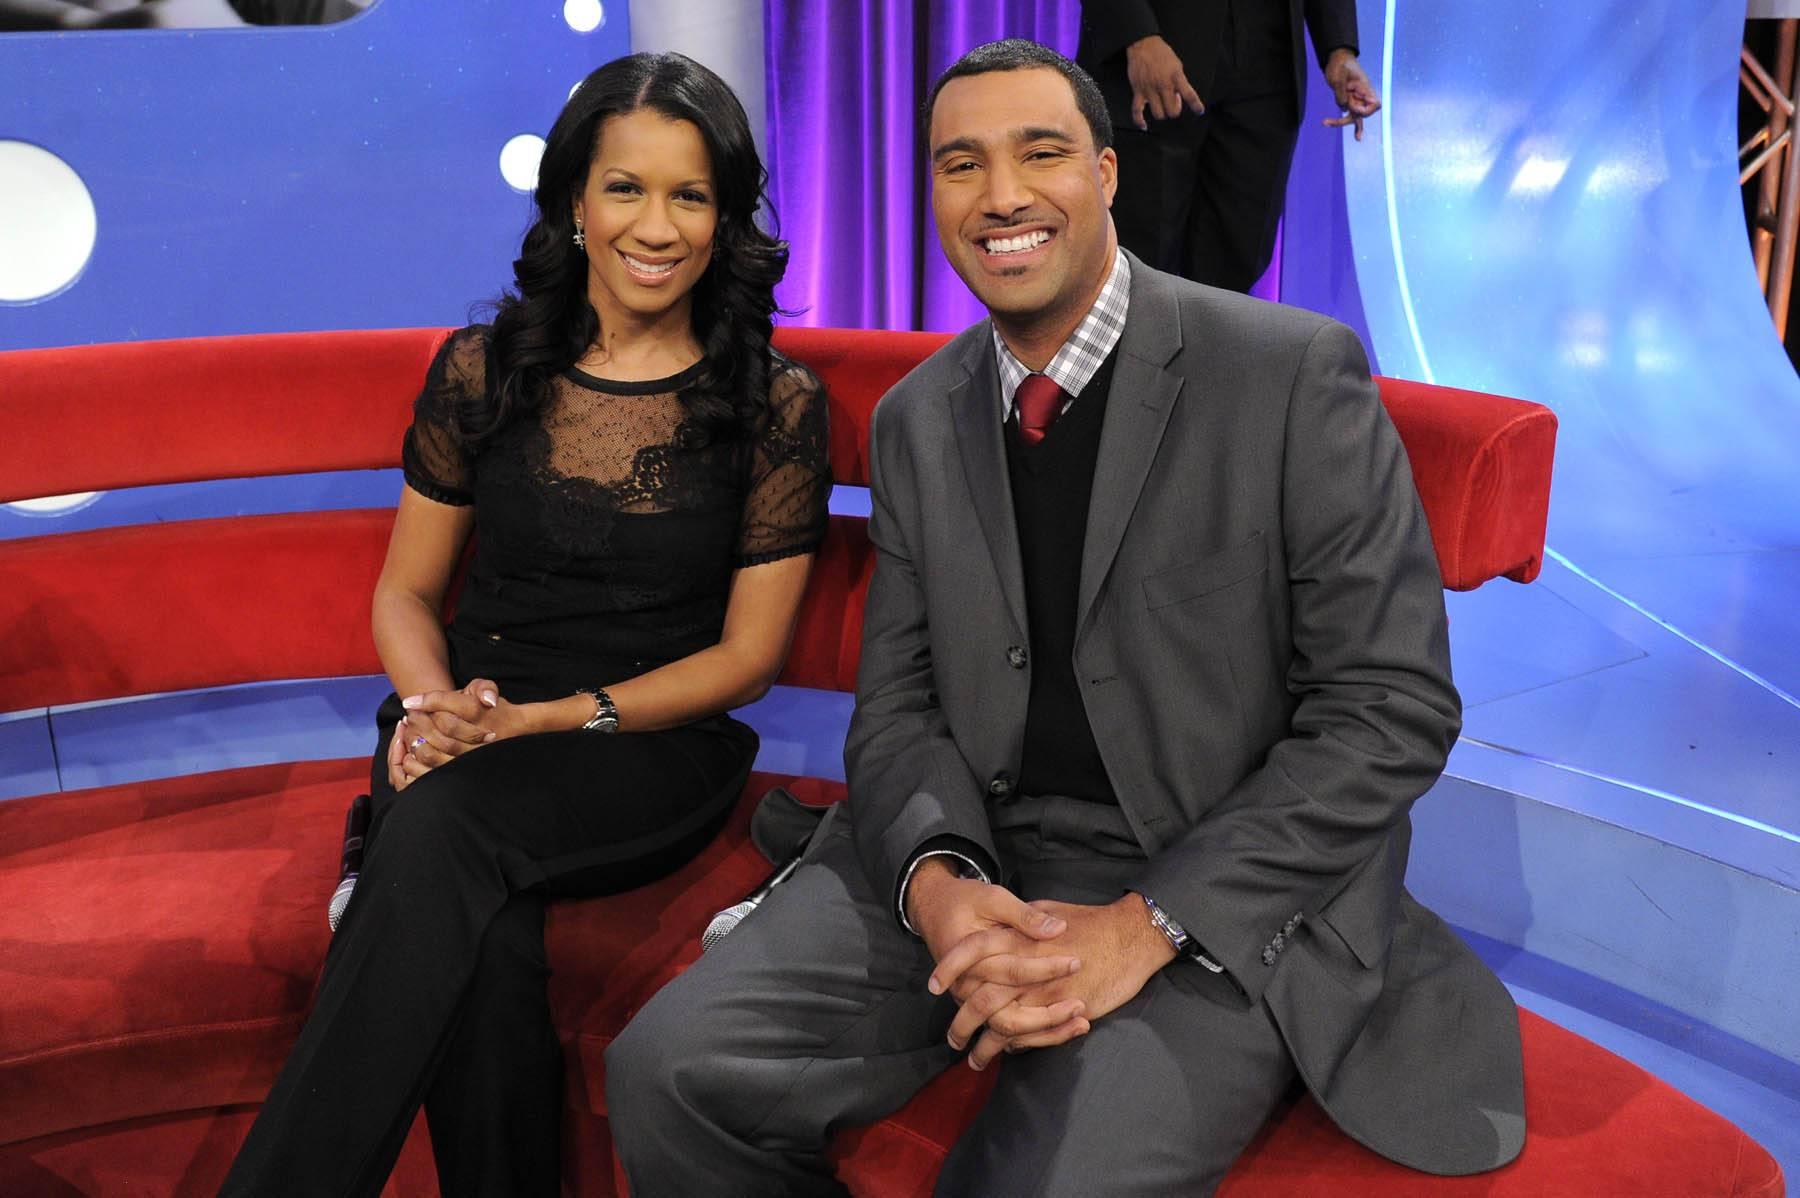 Good to Go - Dr. Michelle and Dr. Alduan Tarrt at 106 & Park, January 30, 2012. (Photo: John Ricard / BET)